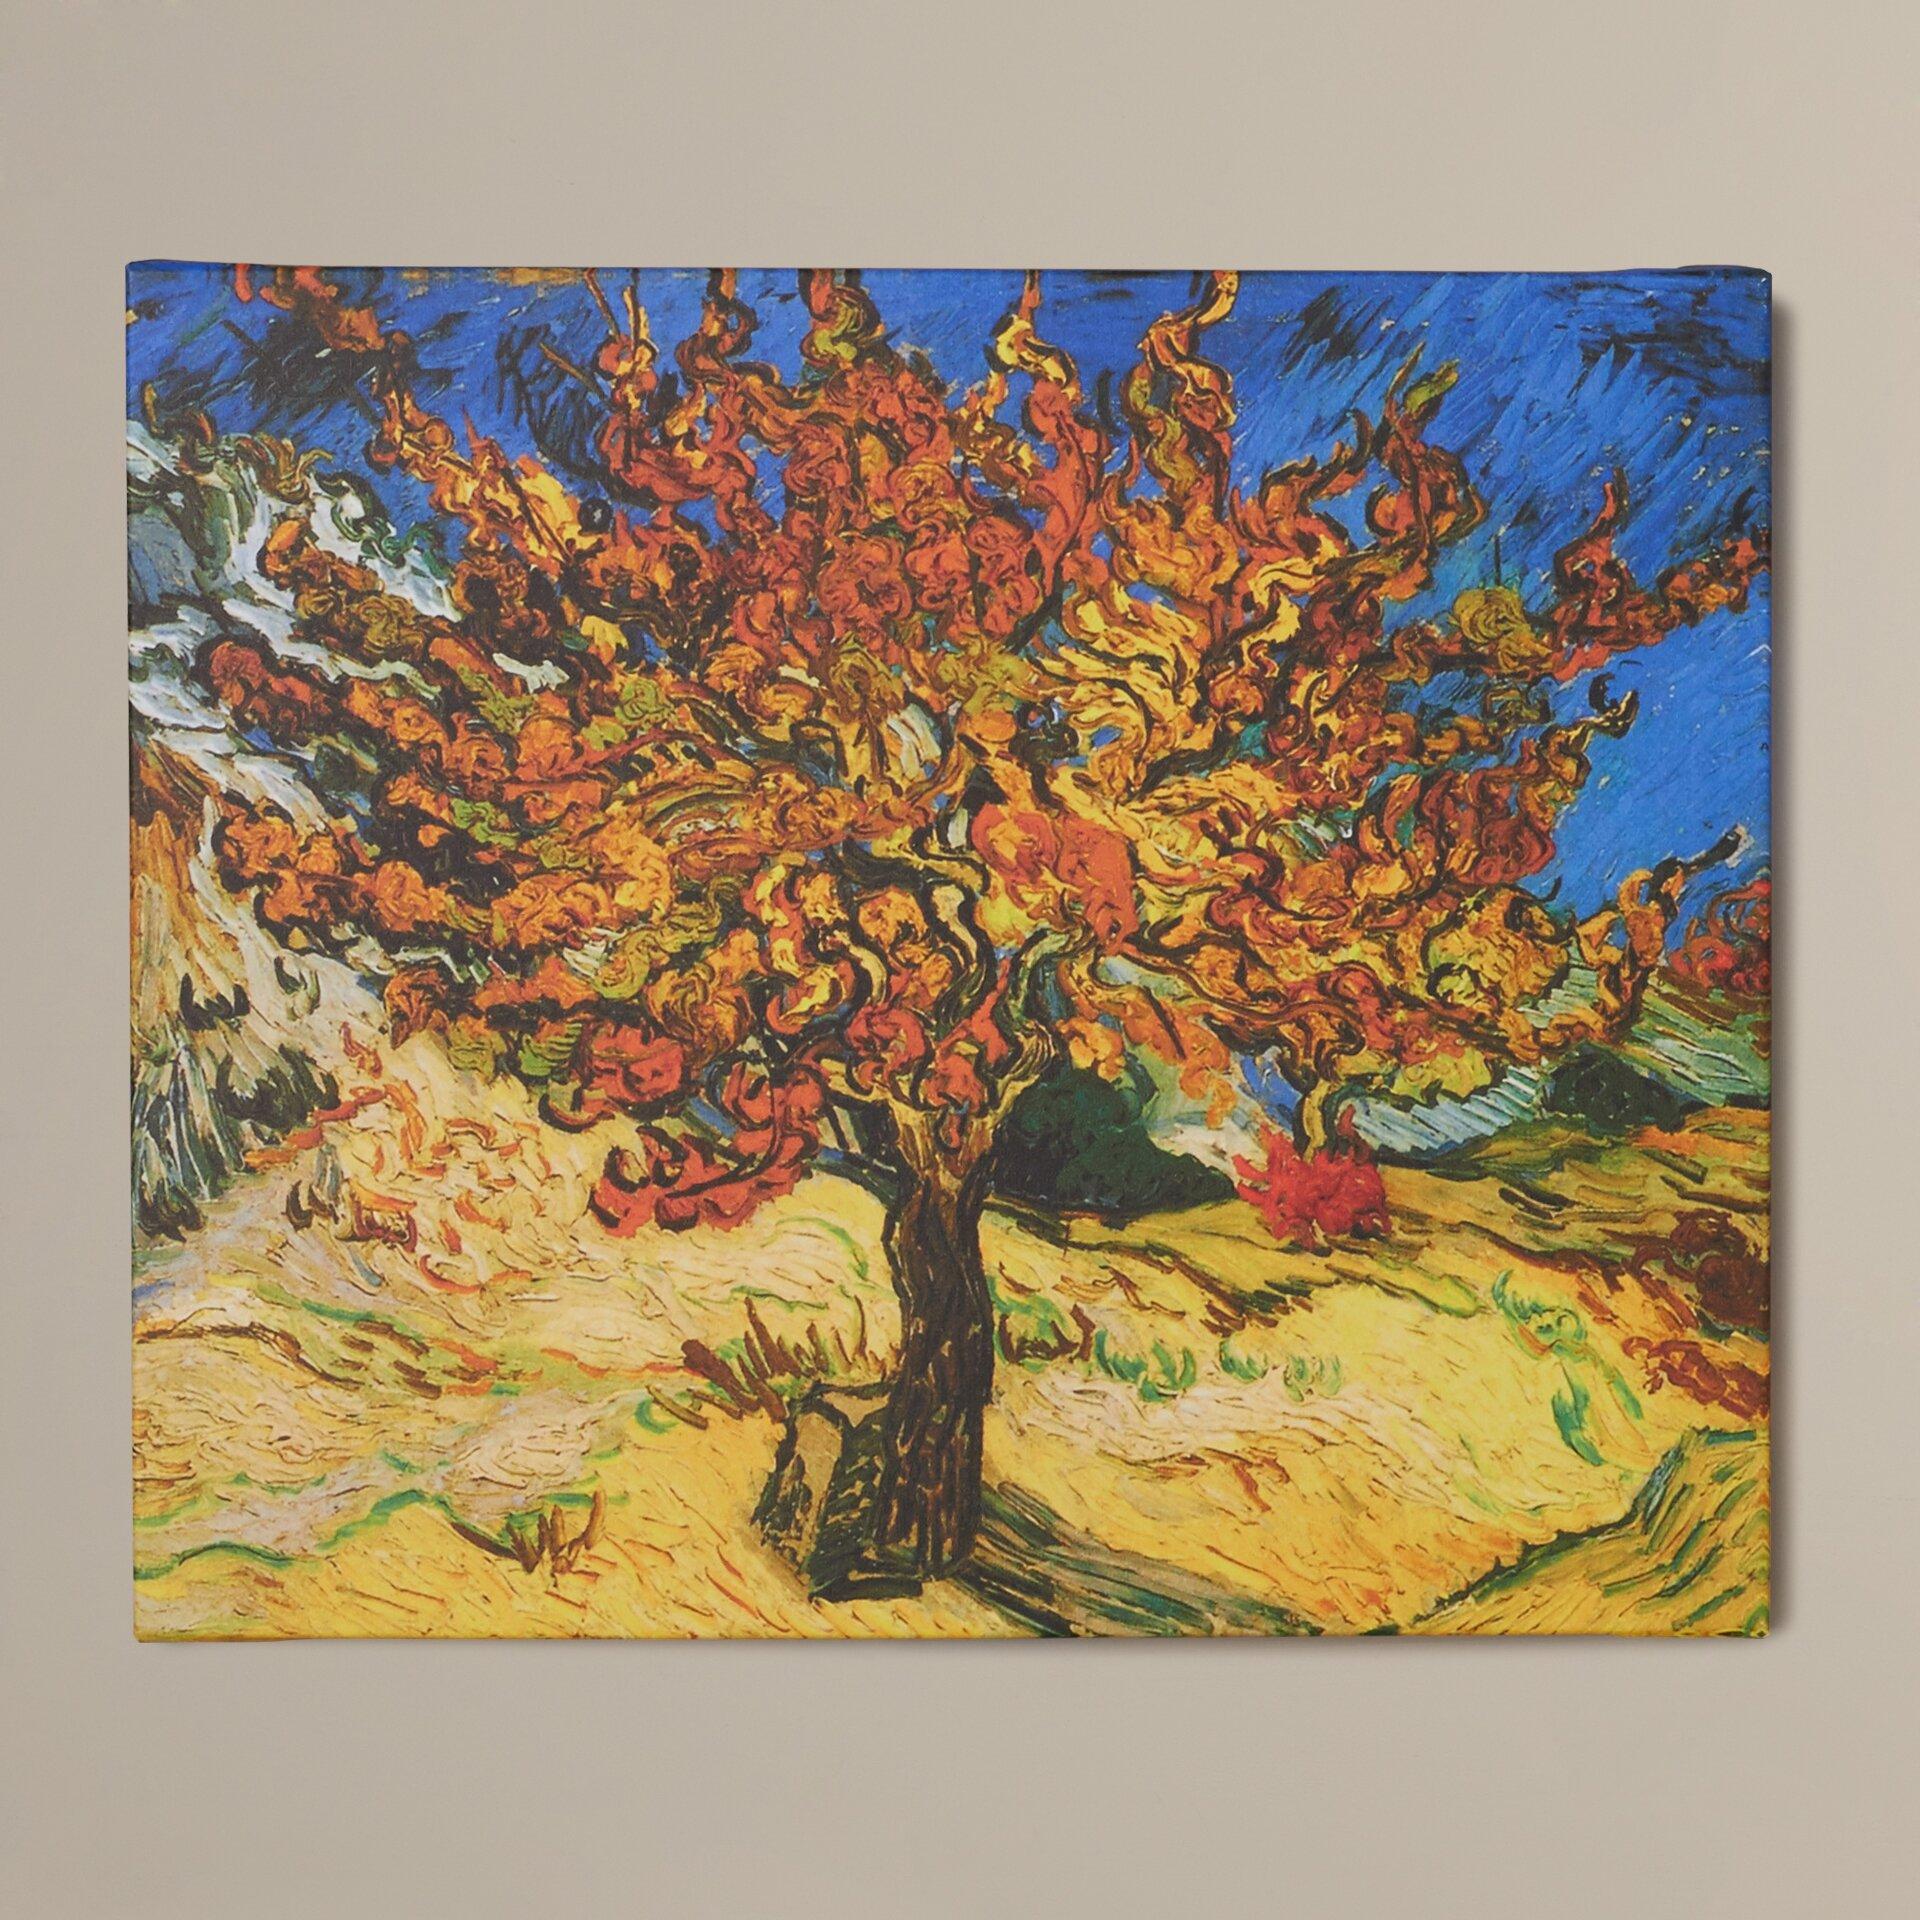 Van Gogh Year 2 %mulberry%btree%%bby%bvincent%bvan%bgogh%bpainting%bprint%bon%bcanvas